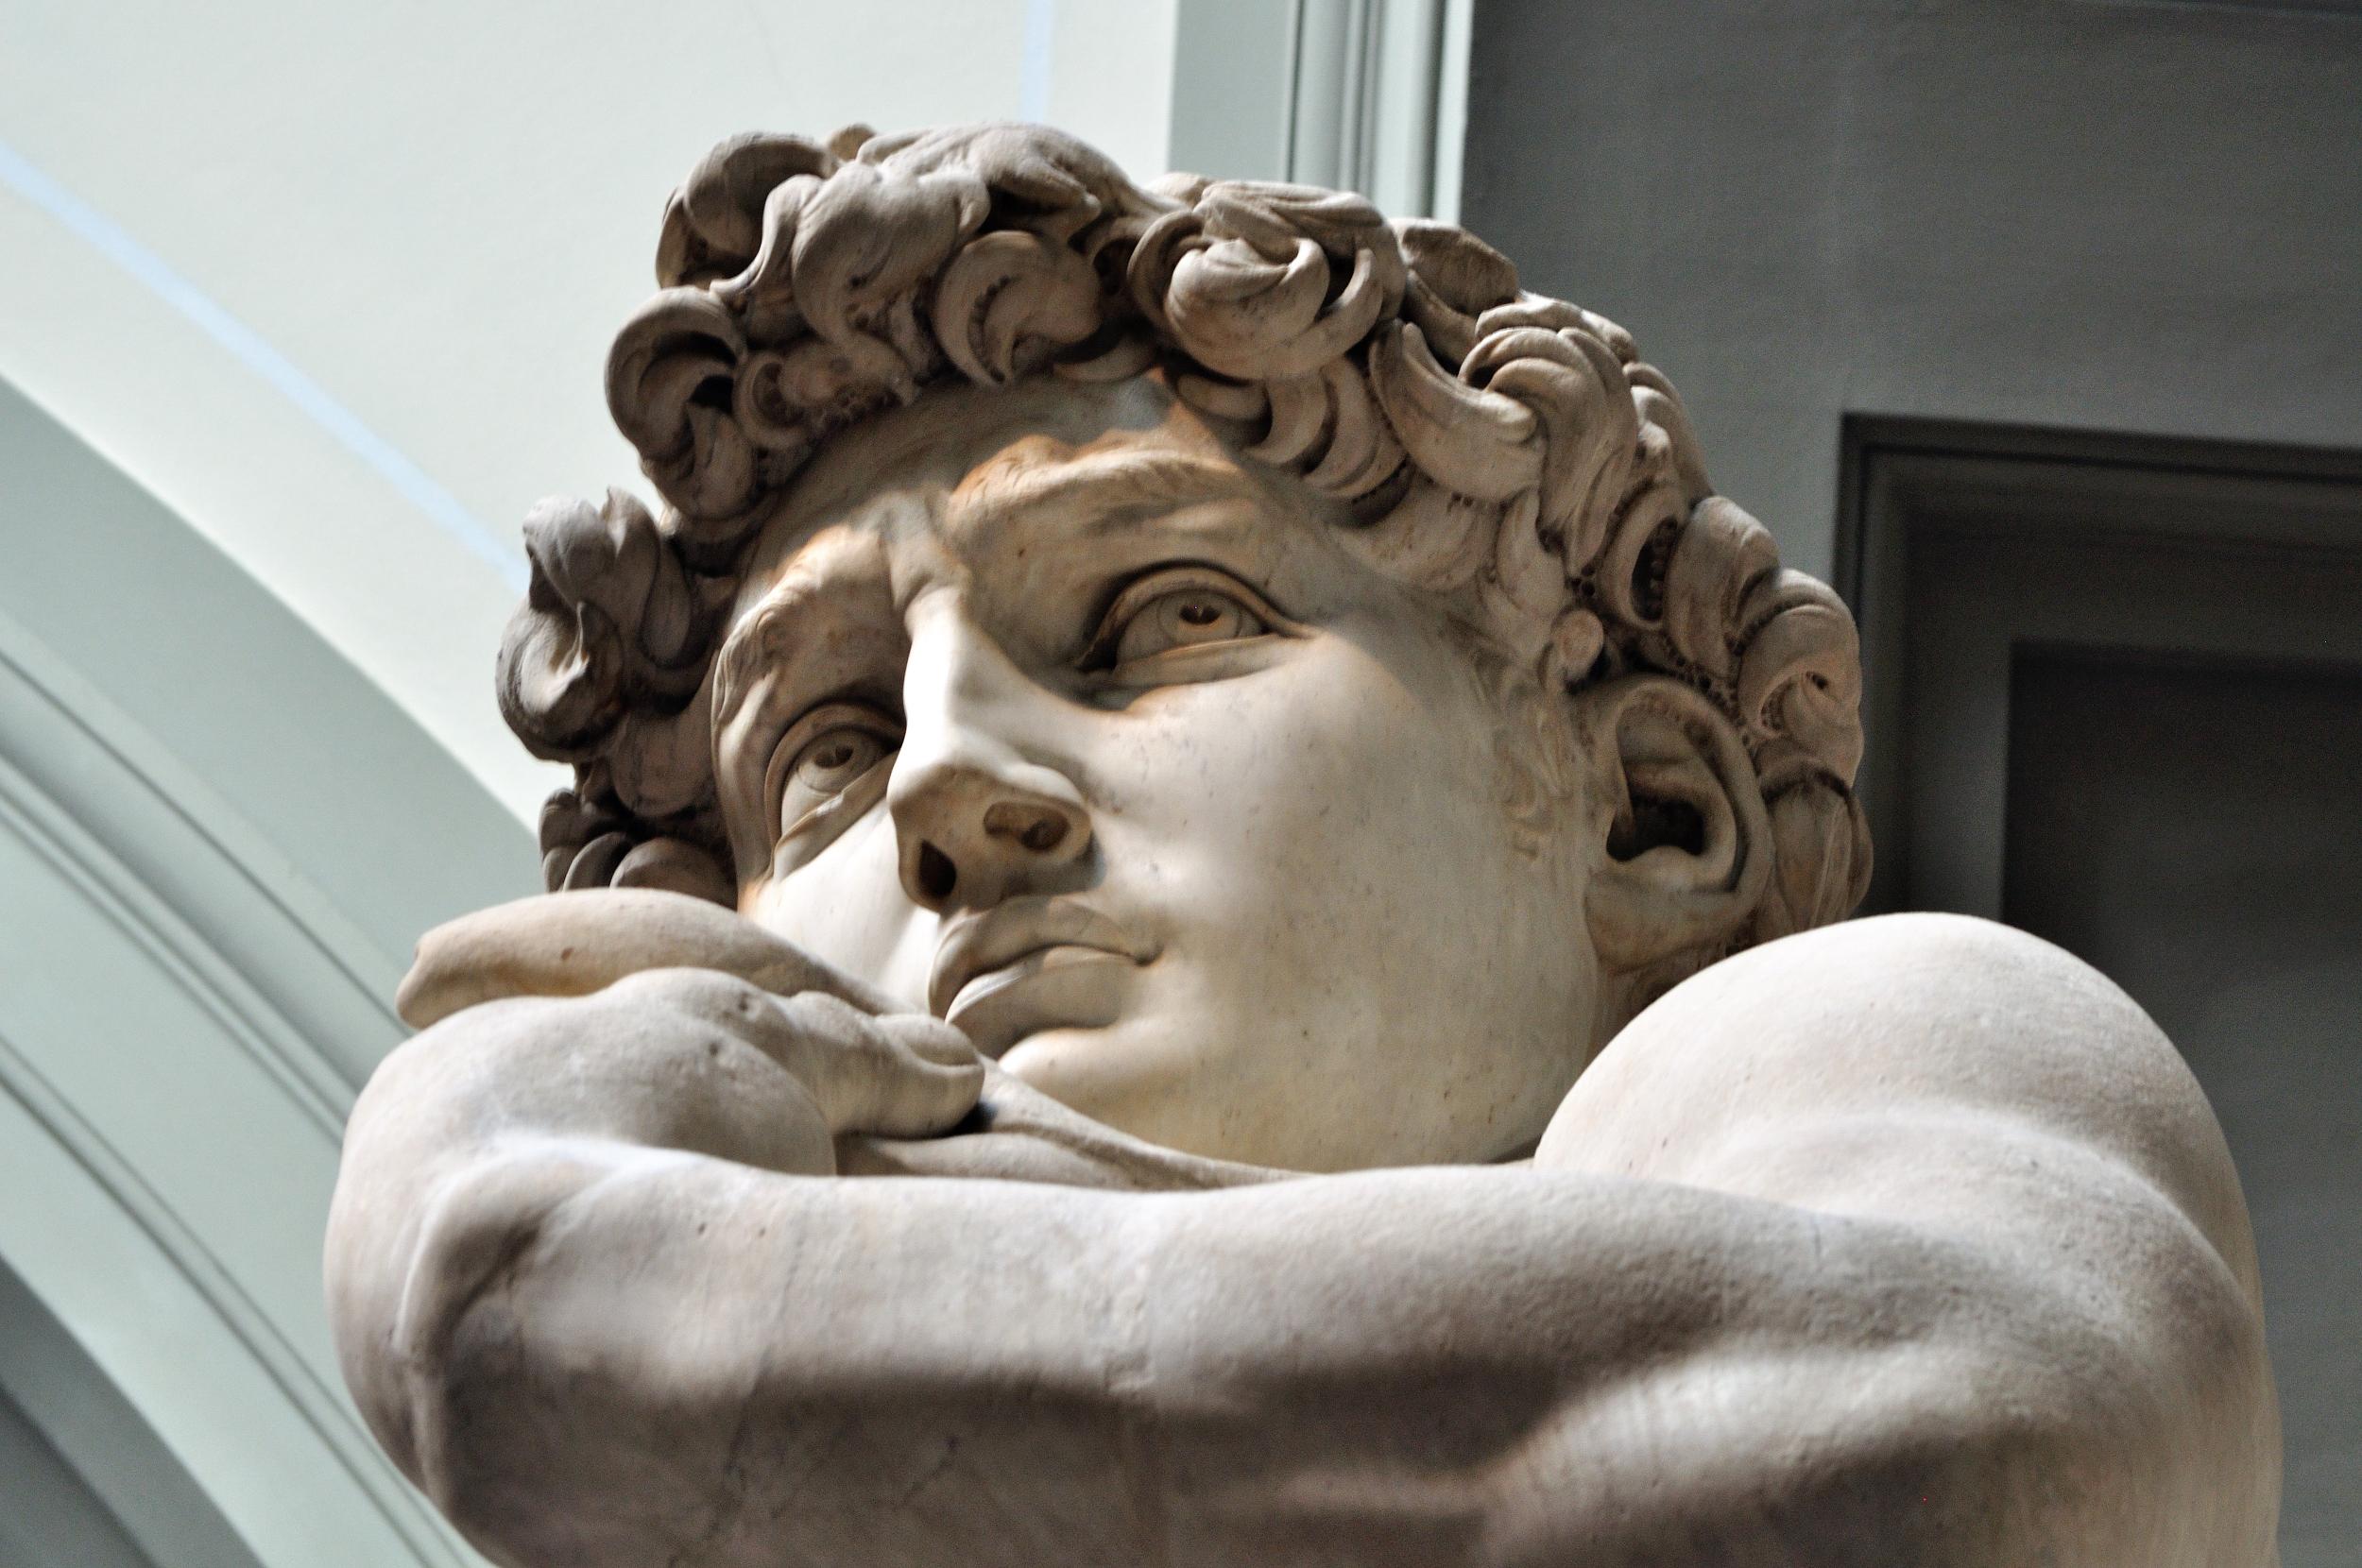 O David de Michelangelo era para ser Hércules, saiba o por quê